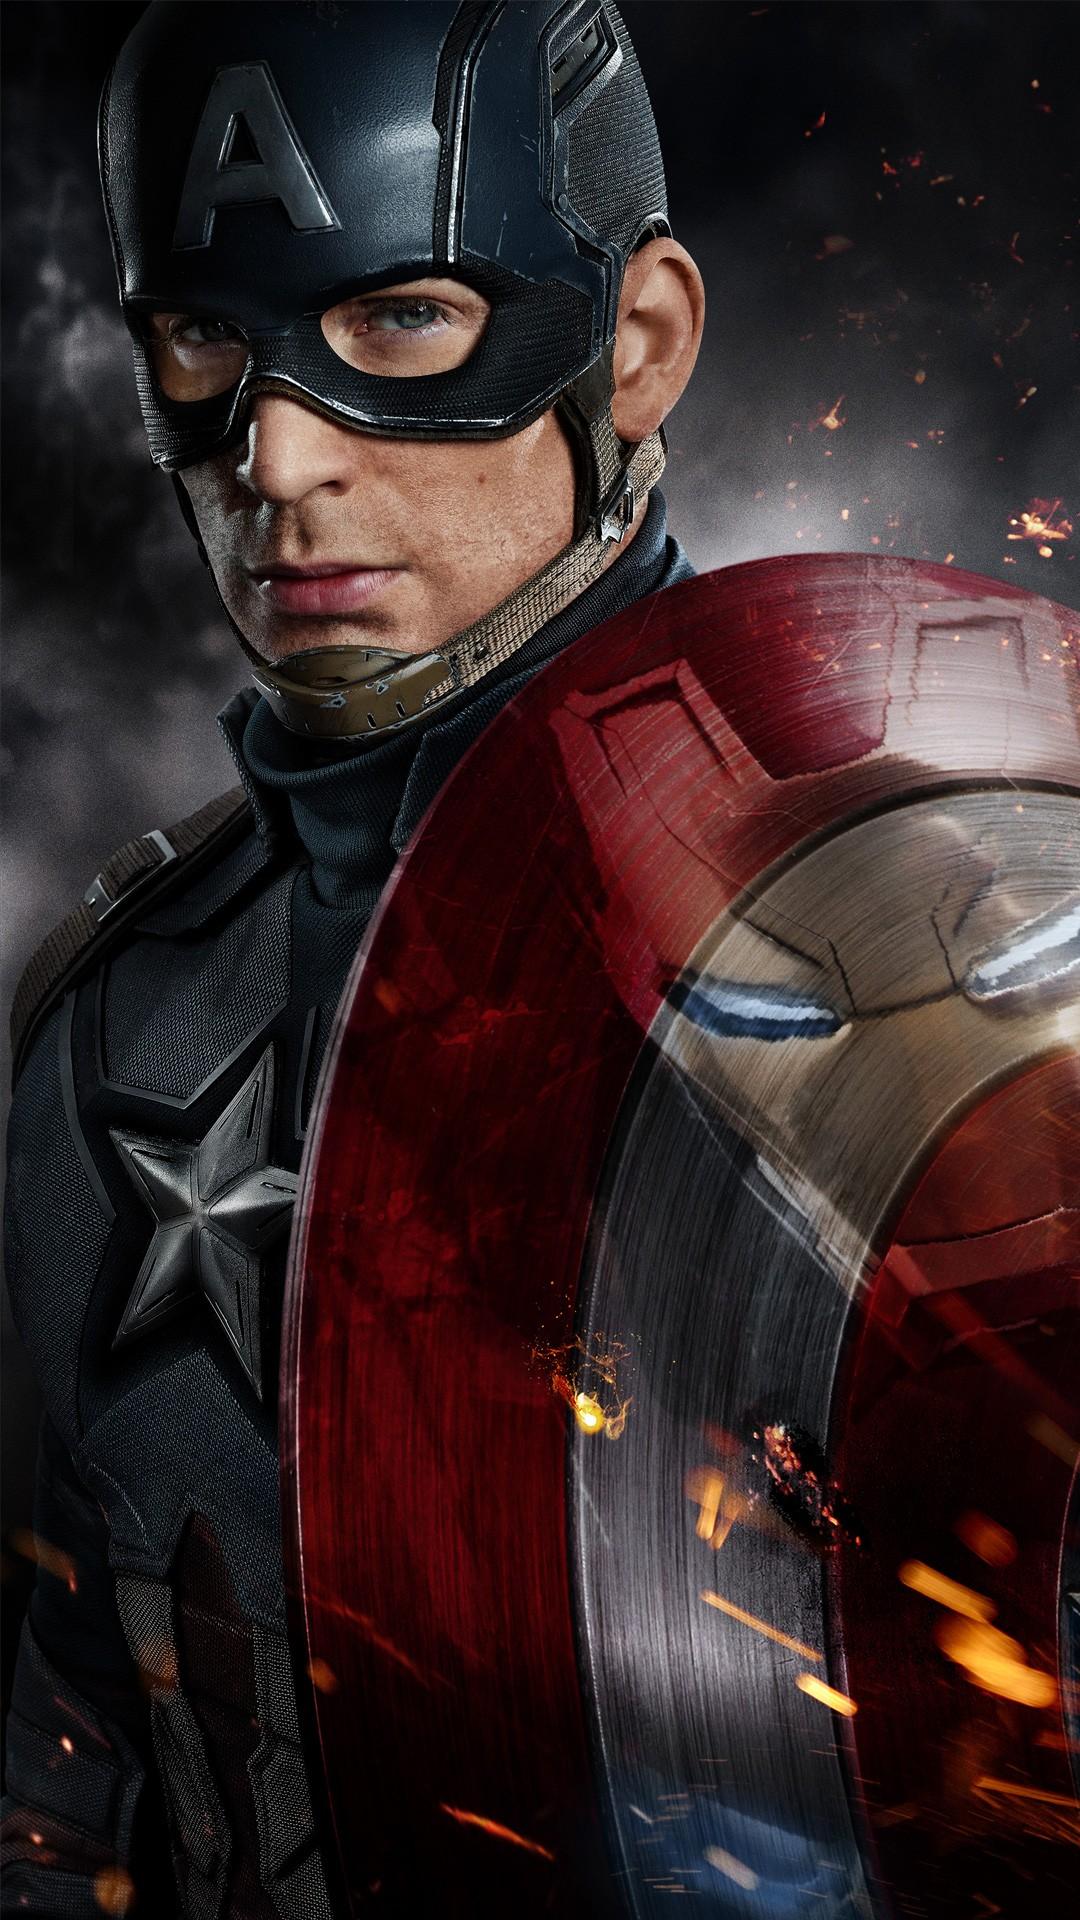 Resolutions 1080 X - Capitan America Civil War , HD Wallpaper & Backgrounds